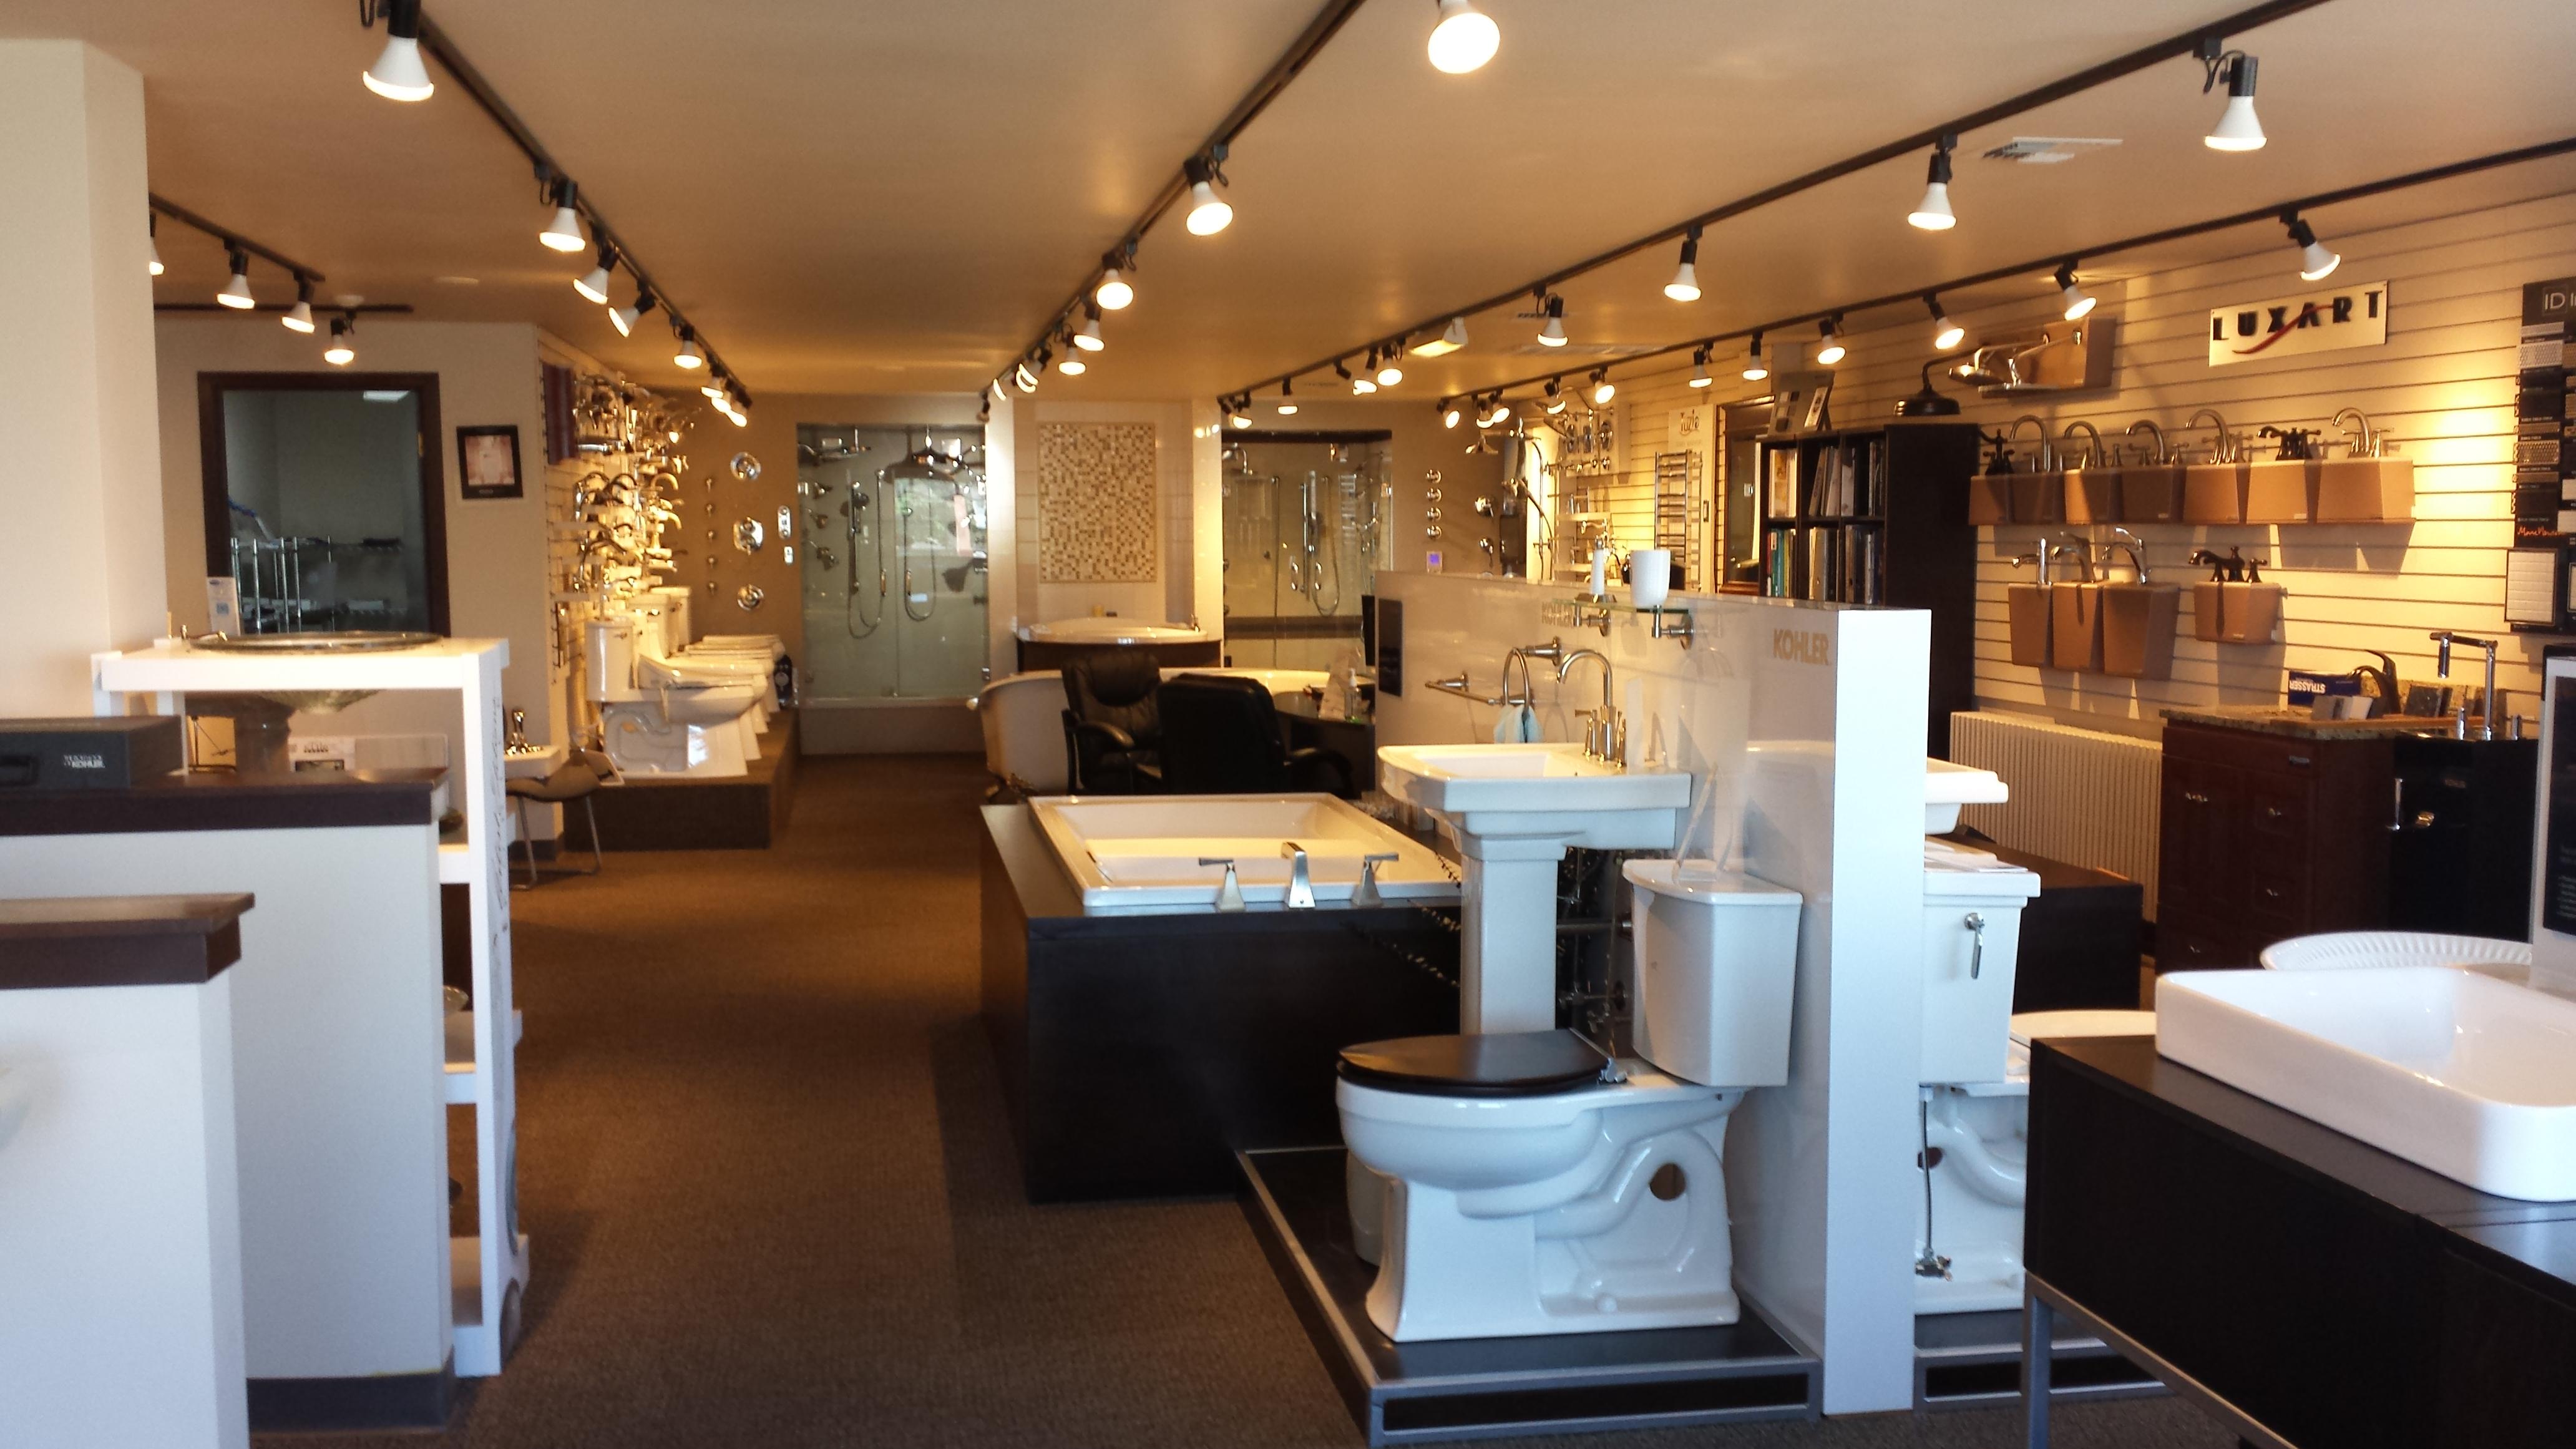 The Bath Kitchen Showplace 102 E Front St Yakima Wa